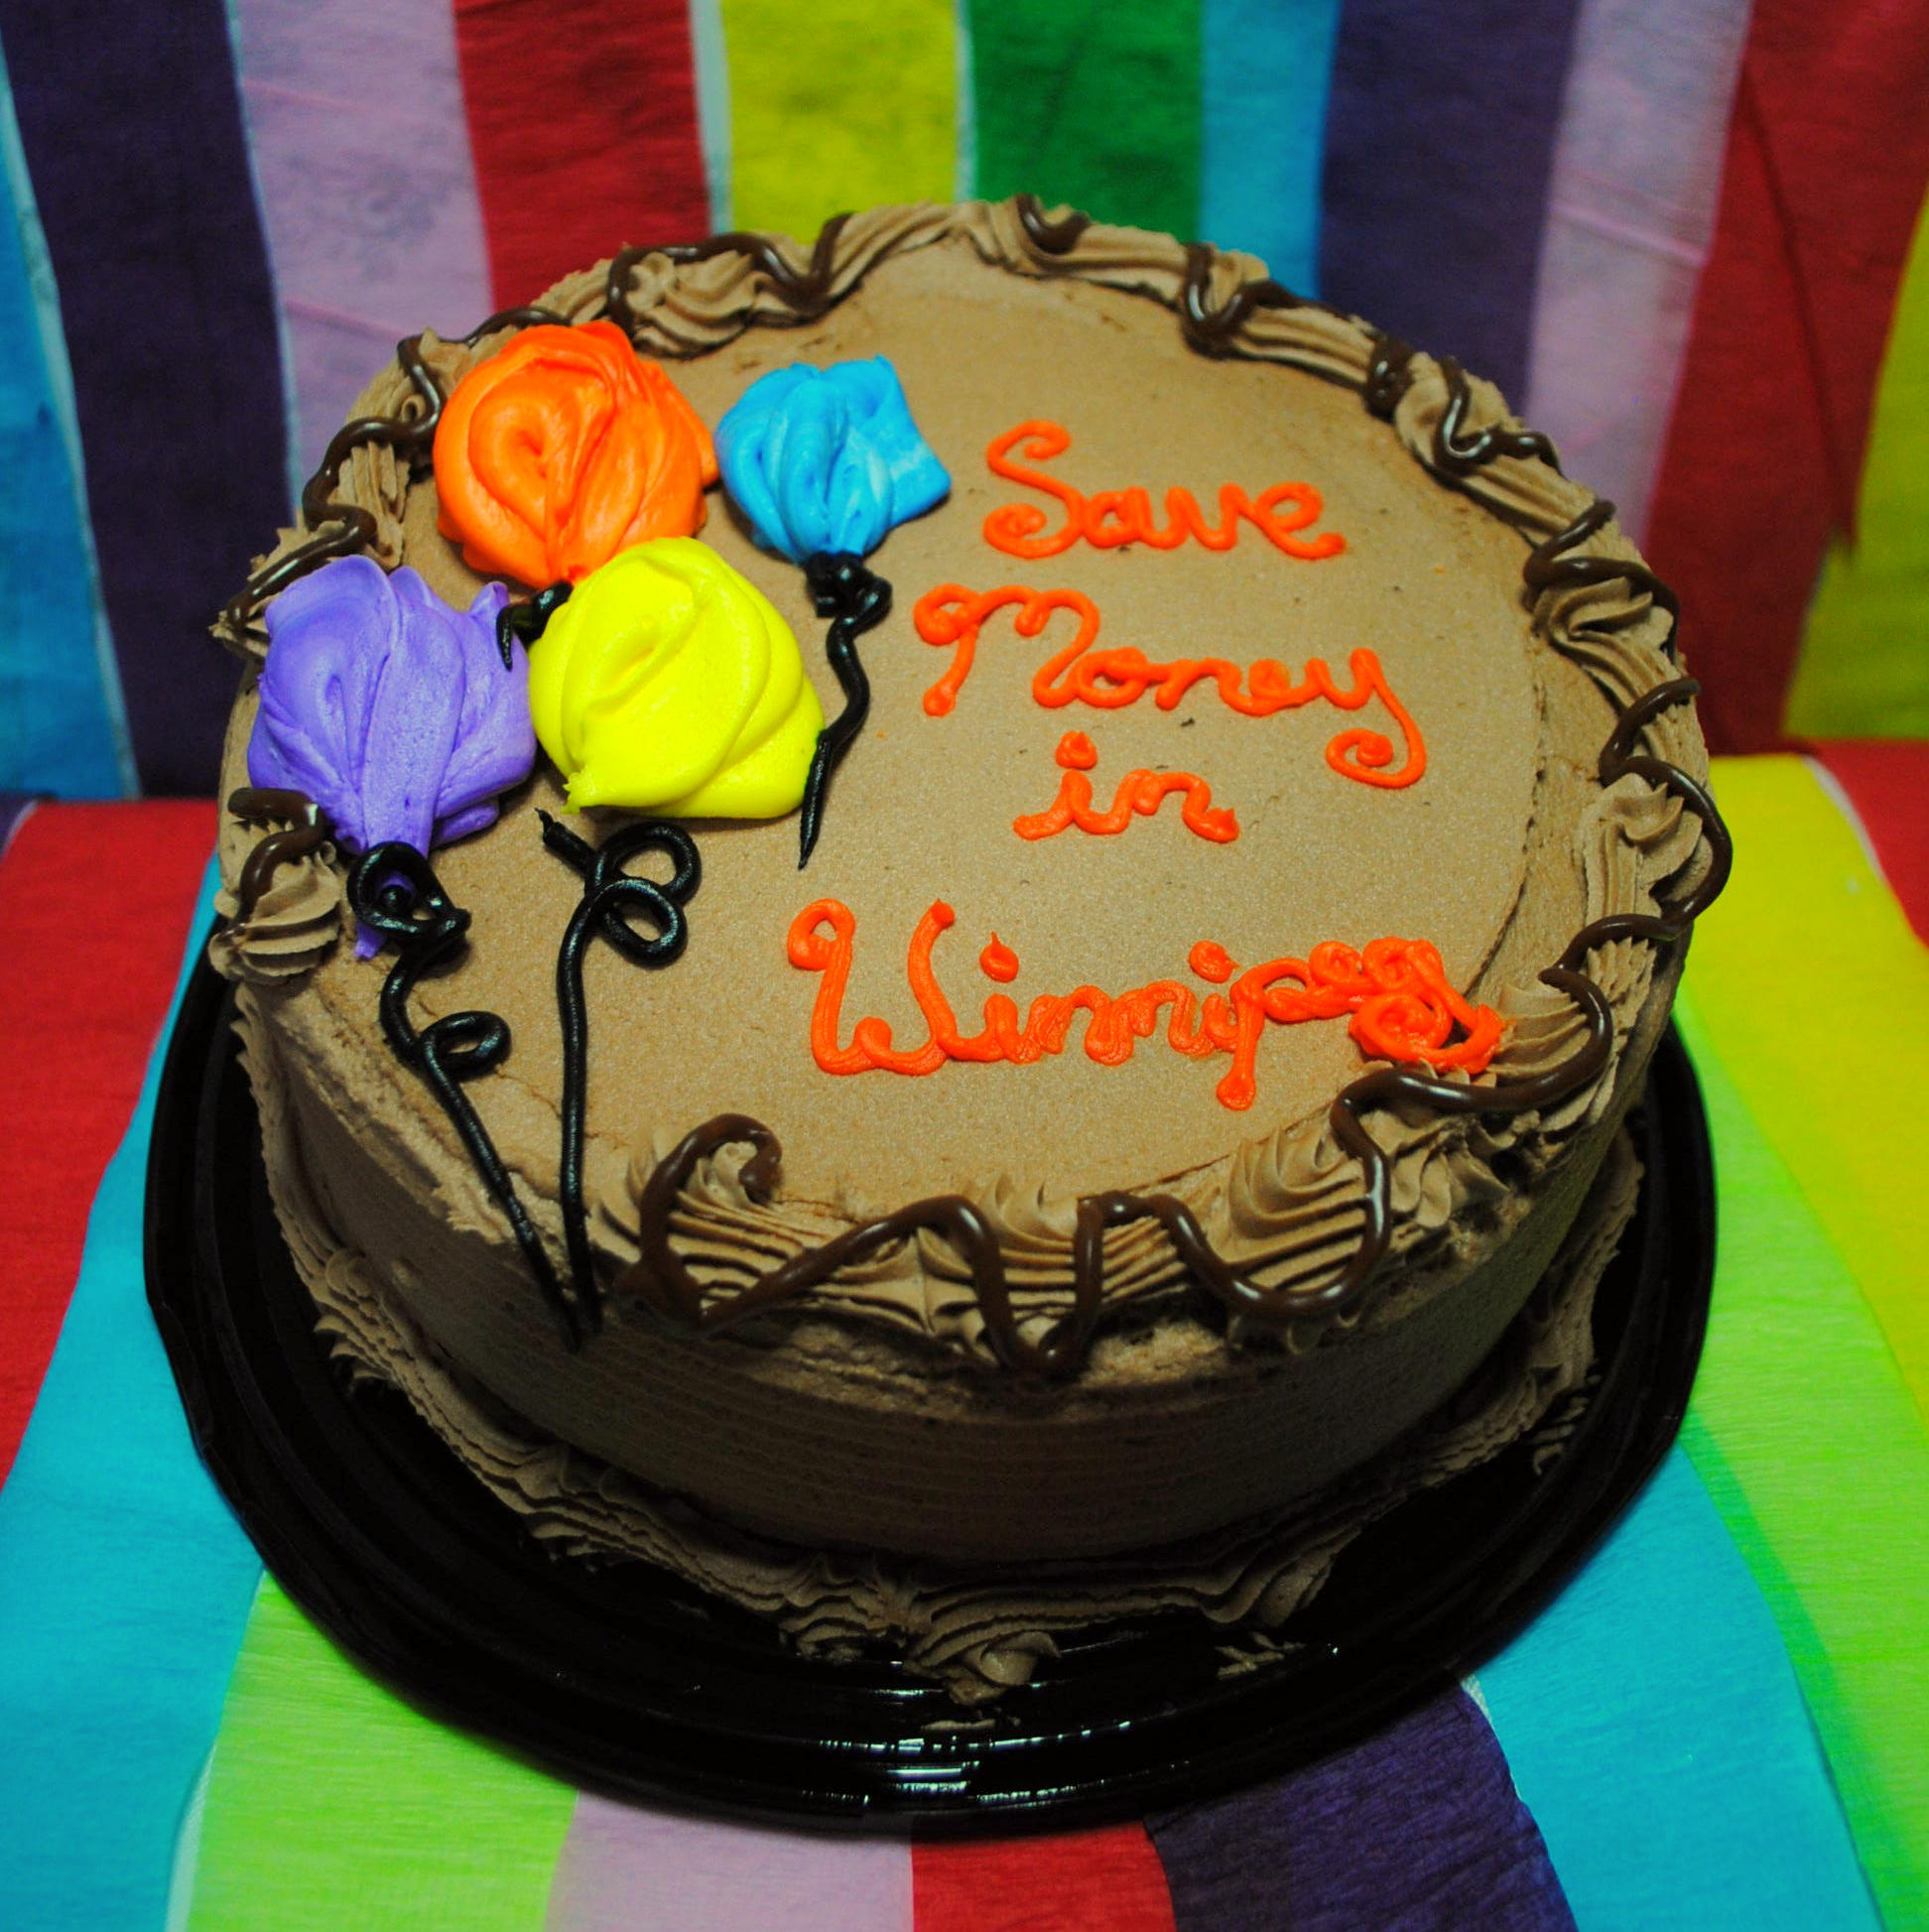 Birthday Party Winnipeg Community Centre Rentals